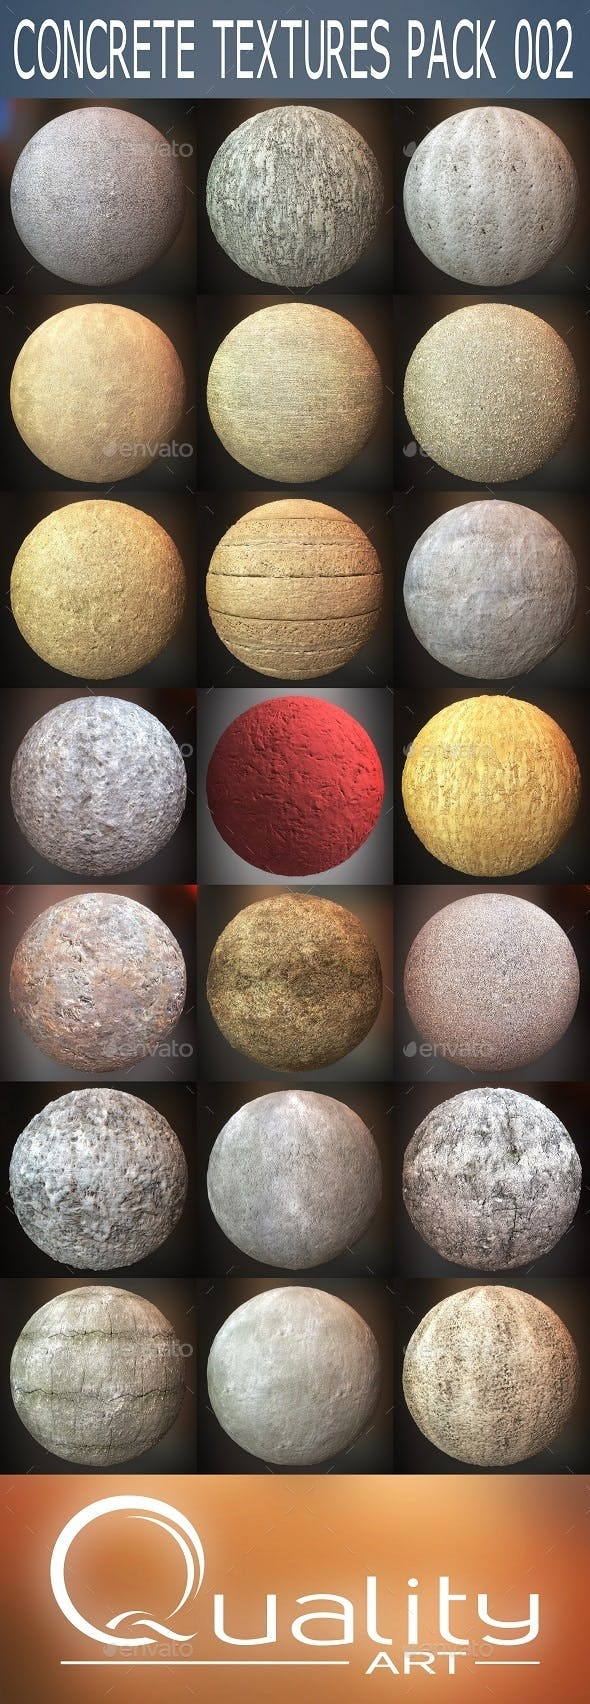 Concrete Textures Pack 002 - 3DOcean Item for Sale